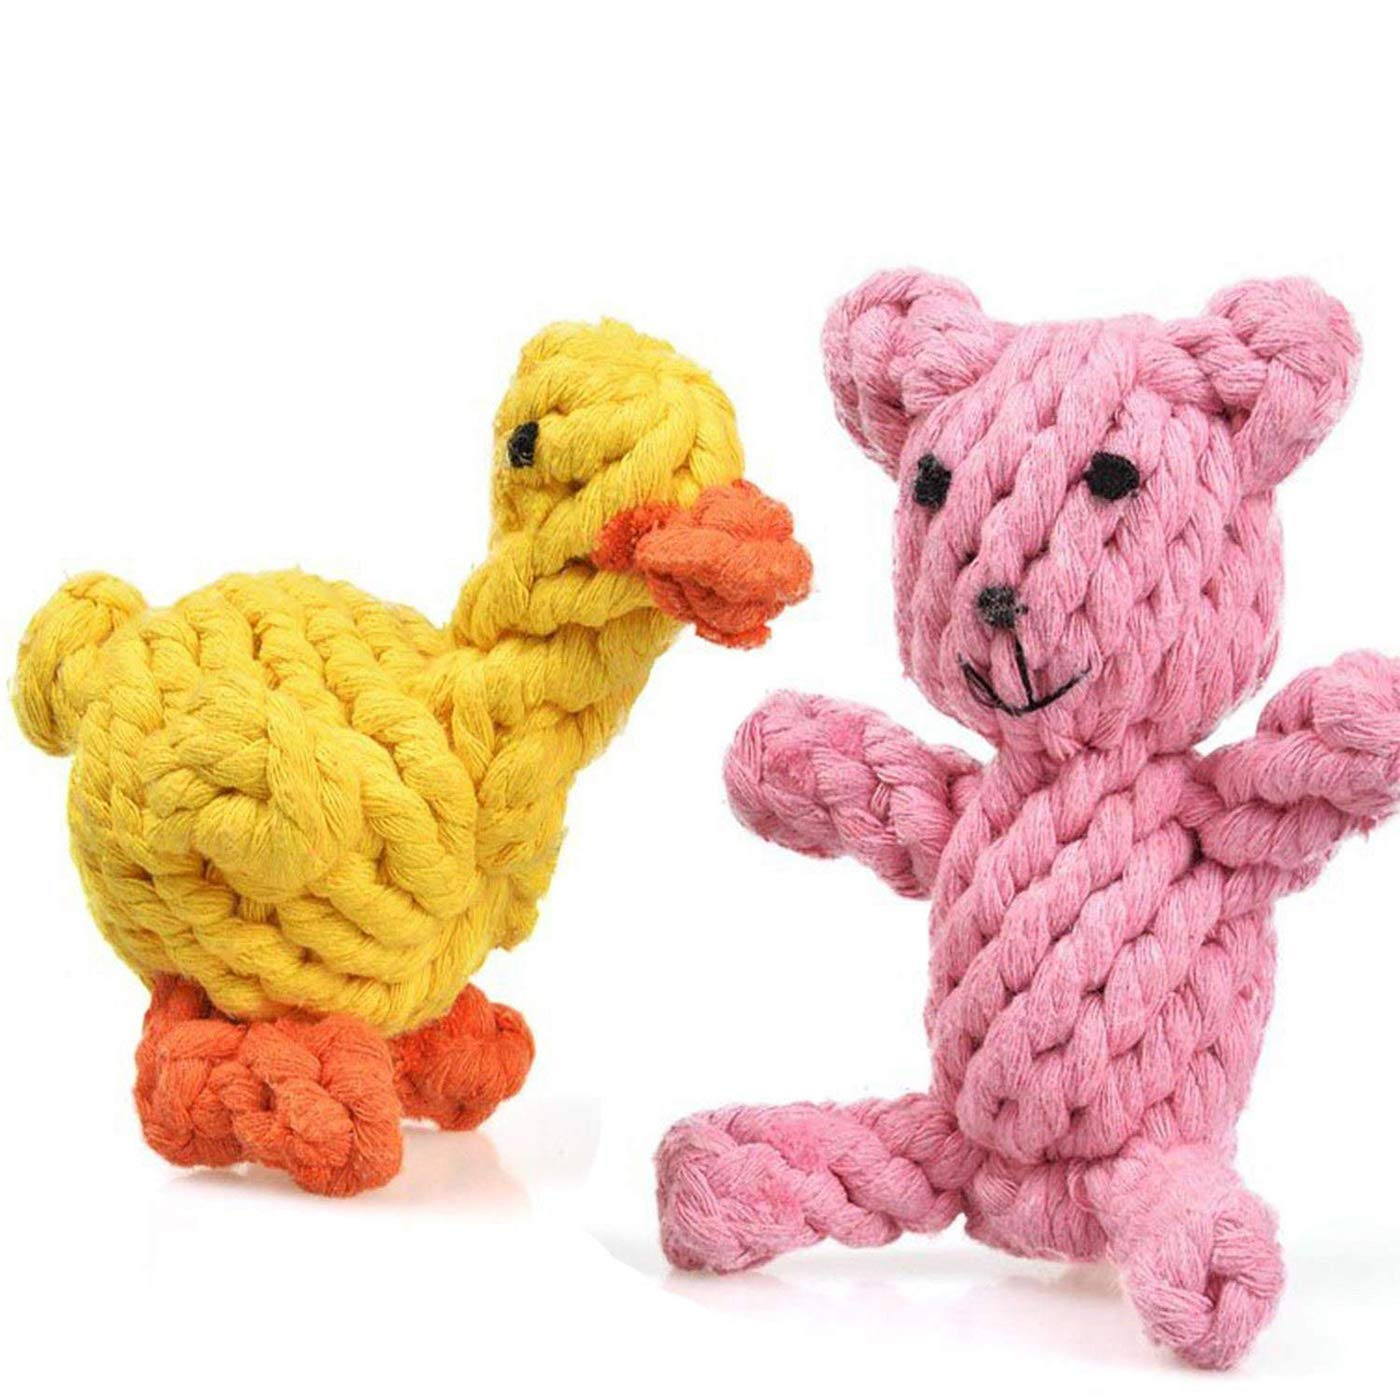 Creaker Puppy Dog Chew Toys, Animal Design Cotton Rope Dog Toys Puppy Pet Play Chew Training